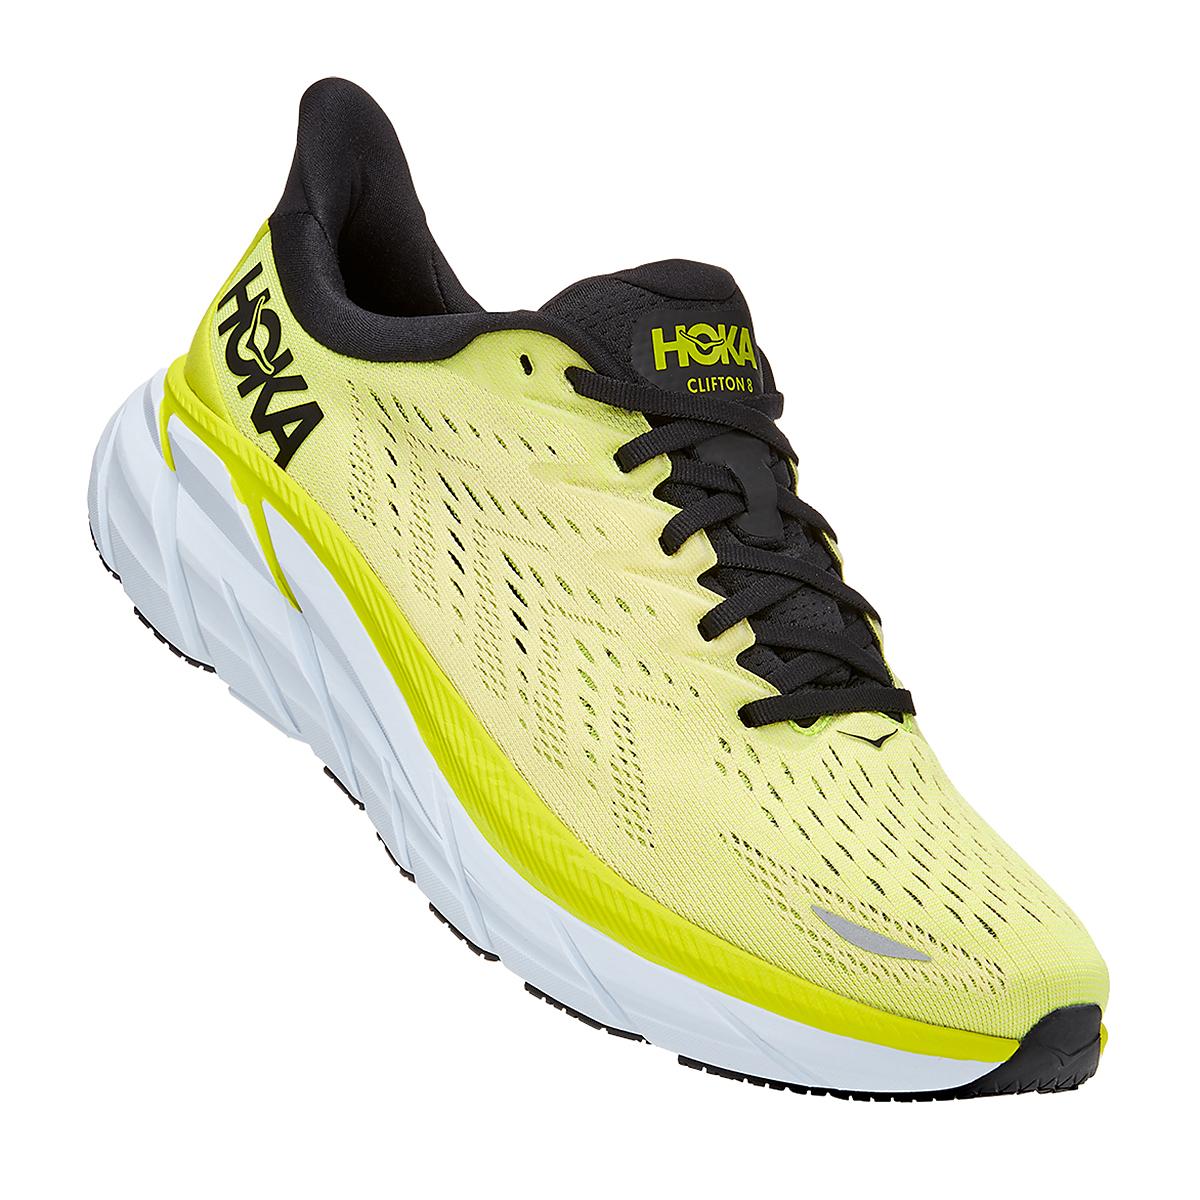 Men's Hoka One One Clifton 8 Running Shoe - Color: Evening Primrose/Charlock - Size: 7 - Width: Regular, Evening Primrose/Charlock, large, image 2